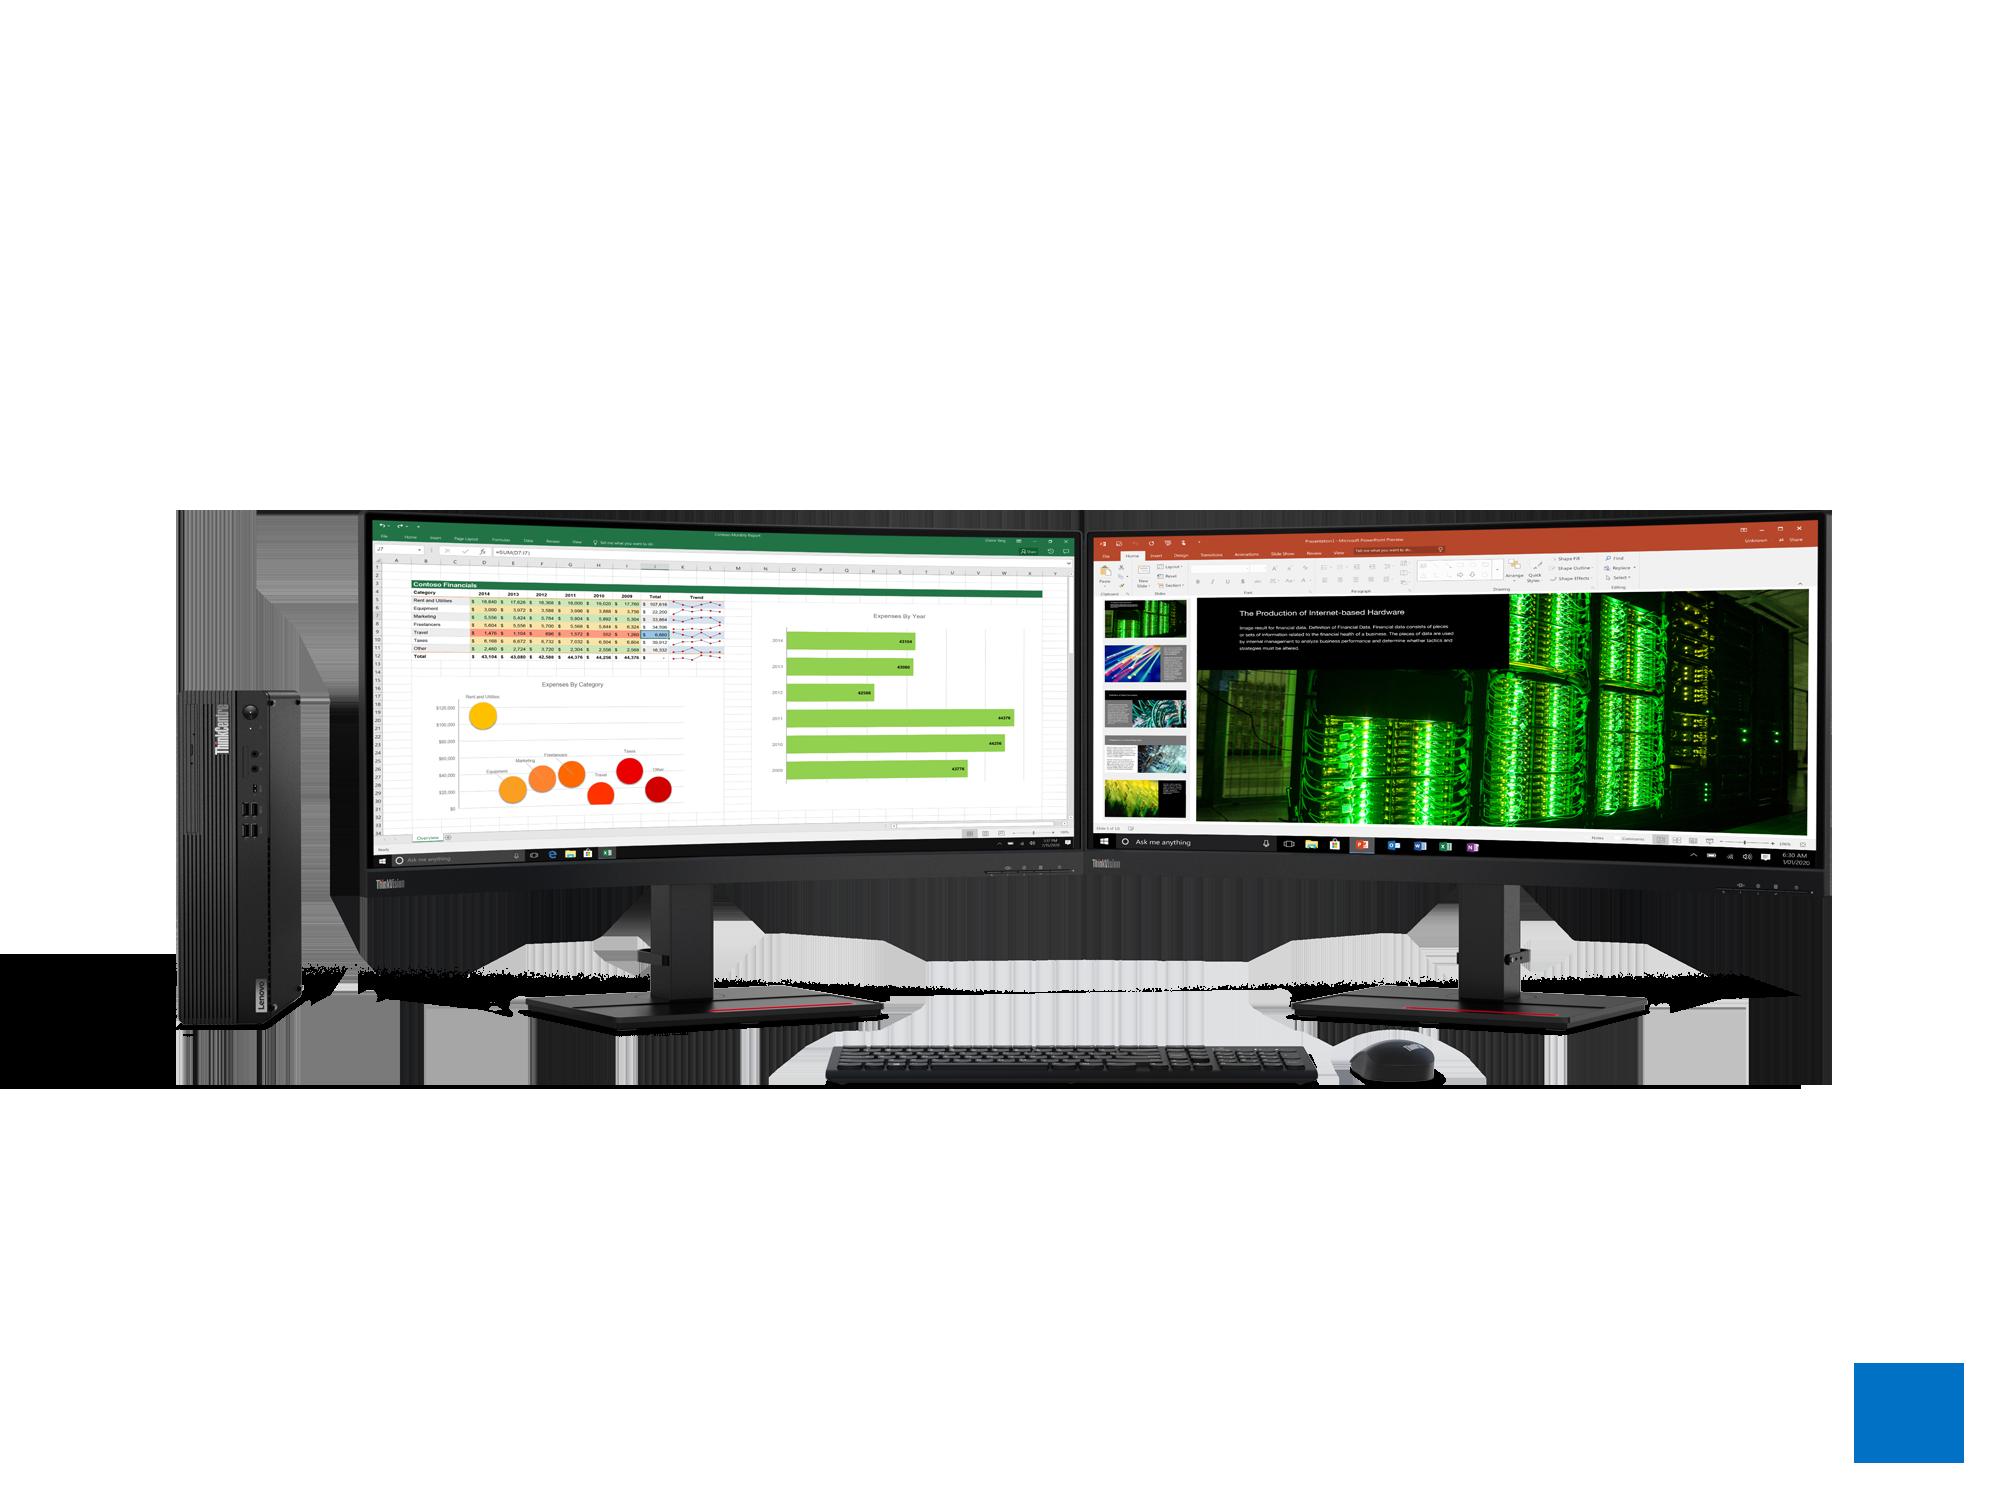 Lenovo ThinkCentre M70